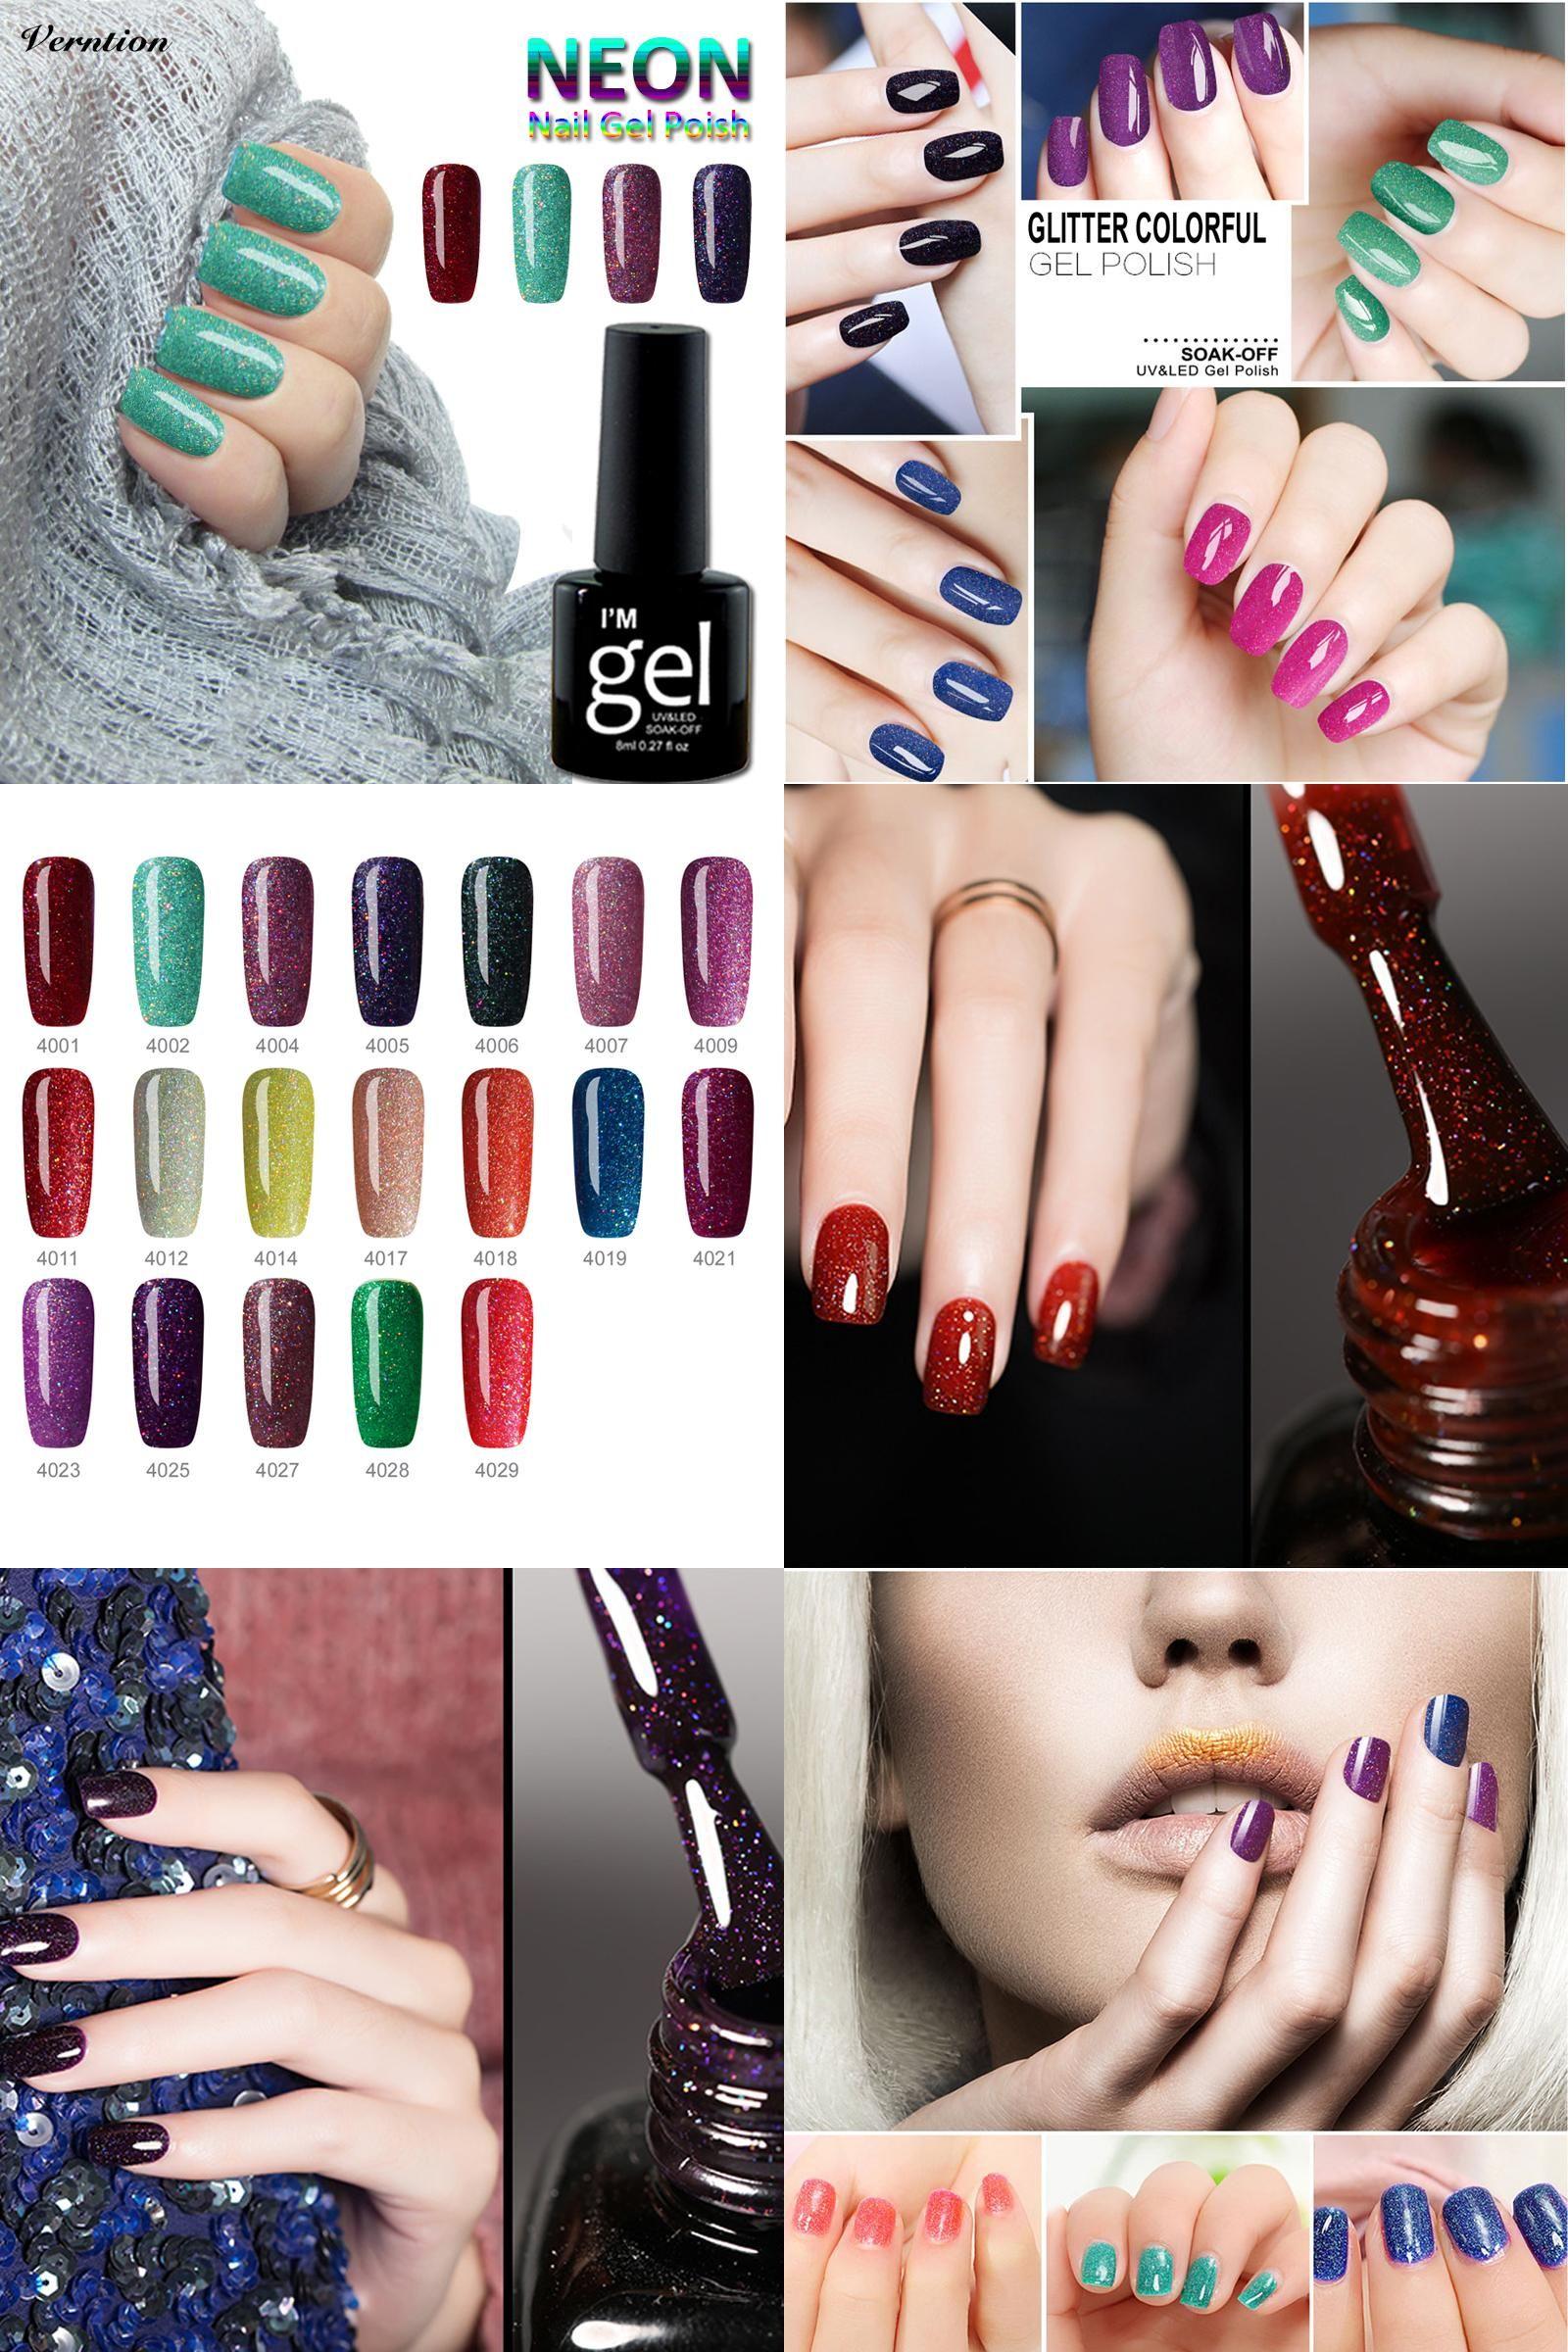 [Visit to Buy] Verntion Bling Neon Color Gel Lak Varnish Soak Off Gelpolish Vernis Semi Permanent 8ml brand UV Top and Base Gel Nail Polish #Advertisement